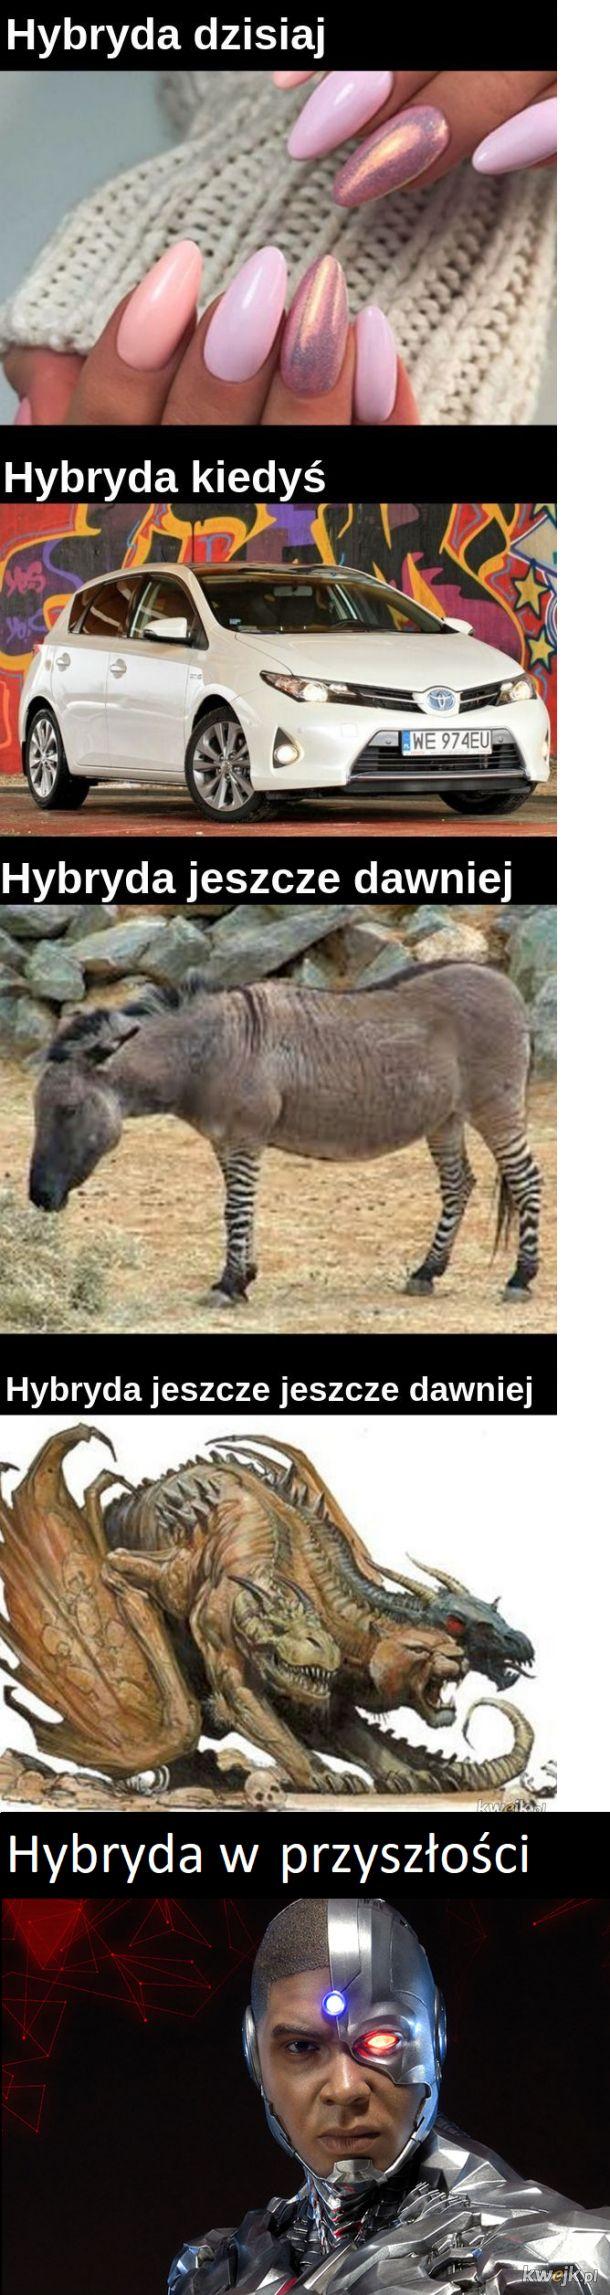 Hybryda kiedyś, teraz i ...kiedyś